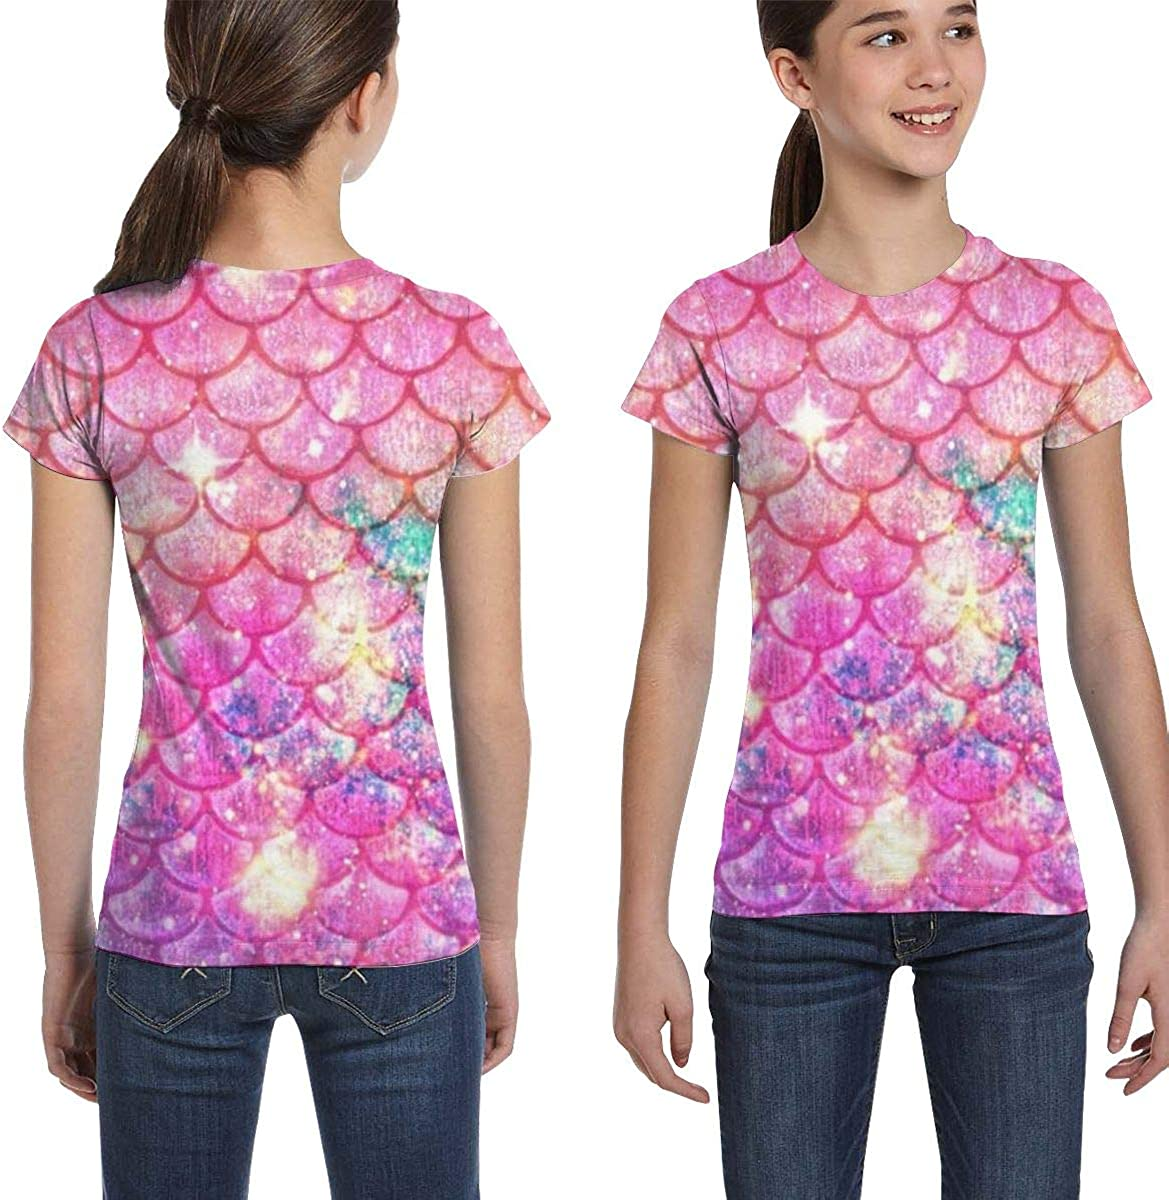 Girls Casual Loose Short Sleeve Mermaid Pattern Fashion Round Neck Tops Tee Shirts